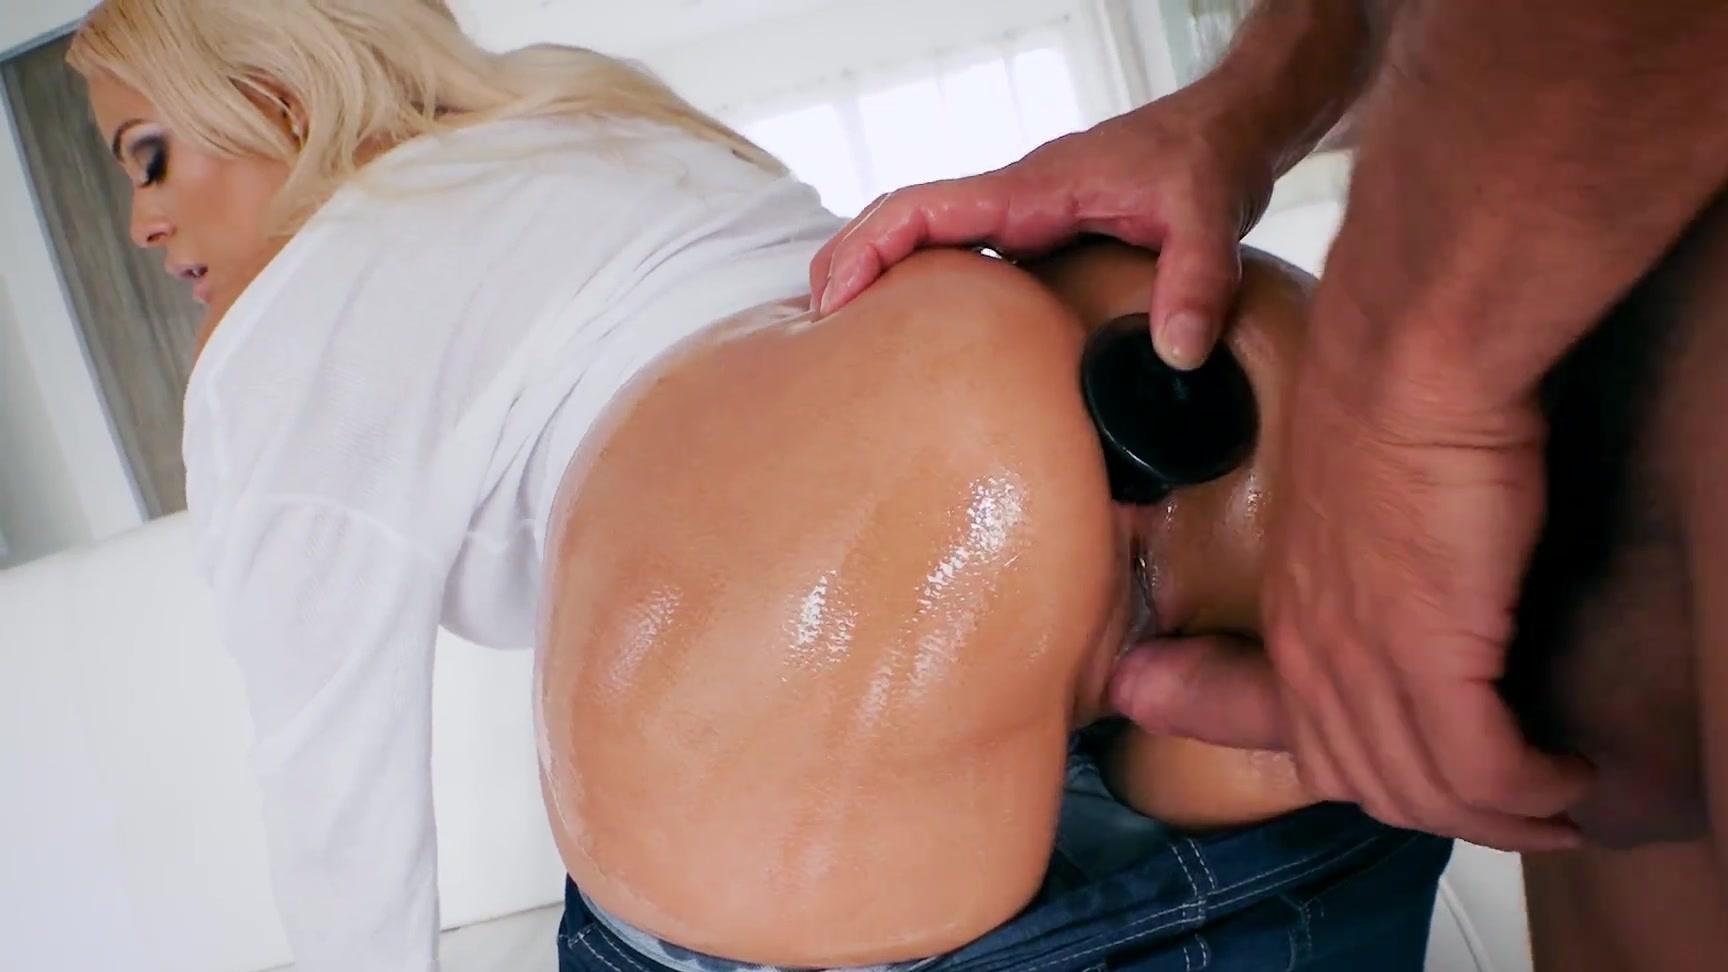 luna star's big booty got oiled for a butt plug & fucked till got